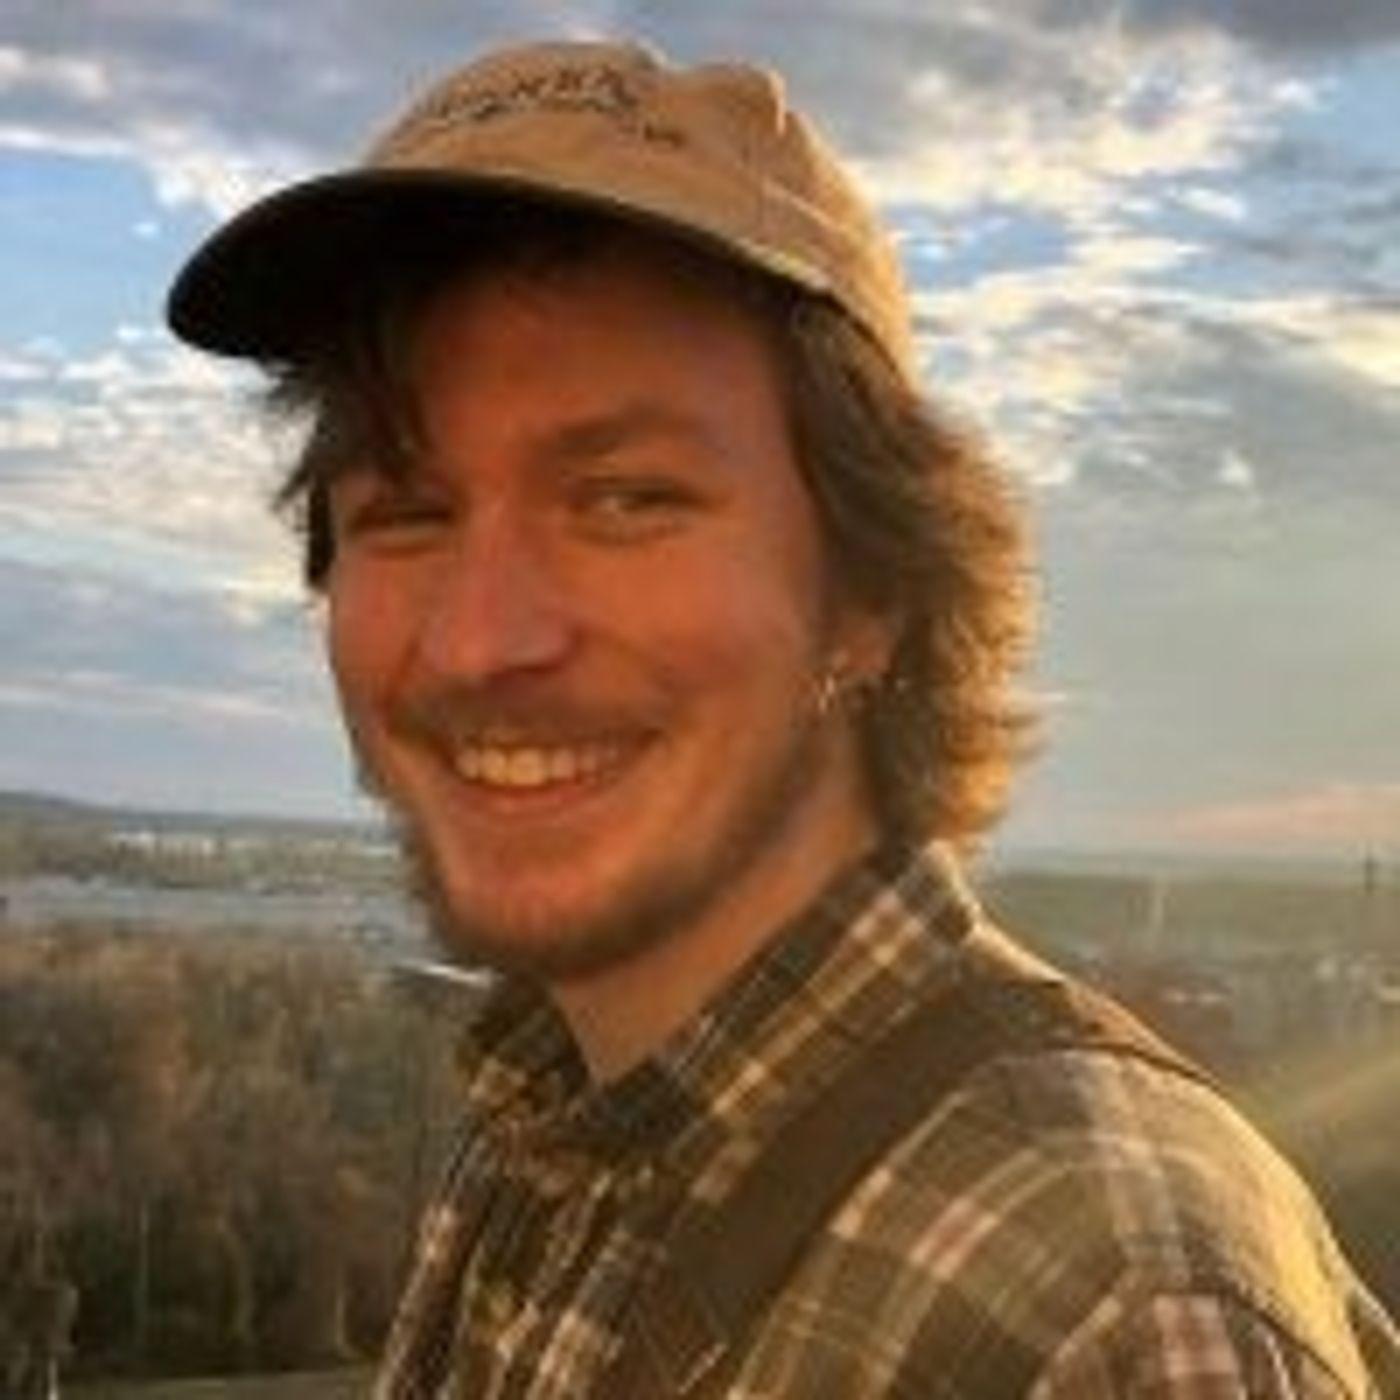 104 - Nick Agliano, Software Engineer